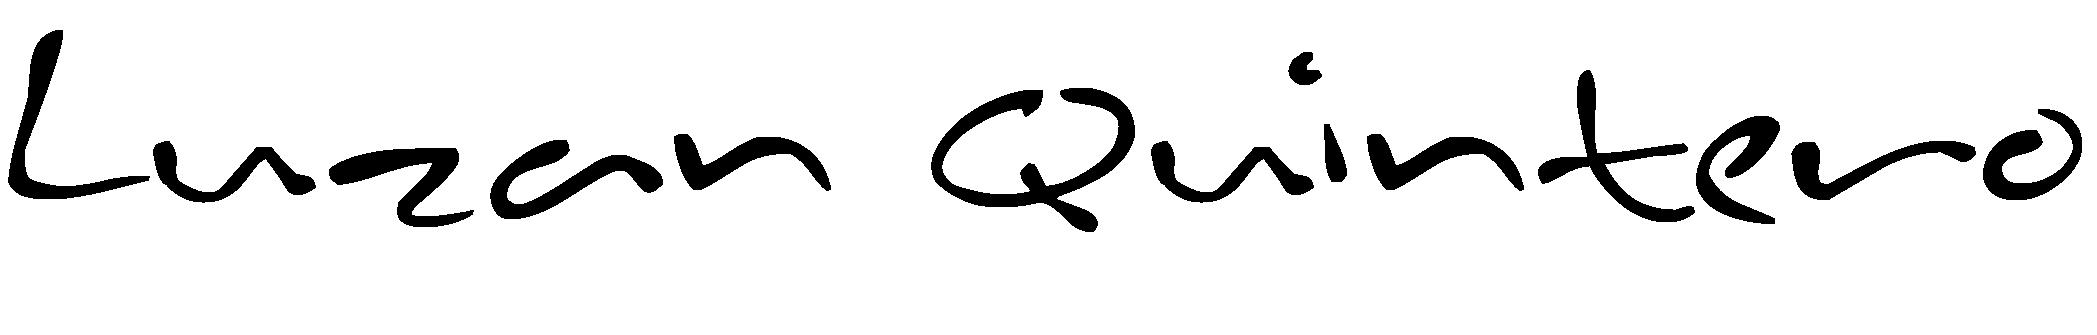 luzan quintero's Signature